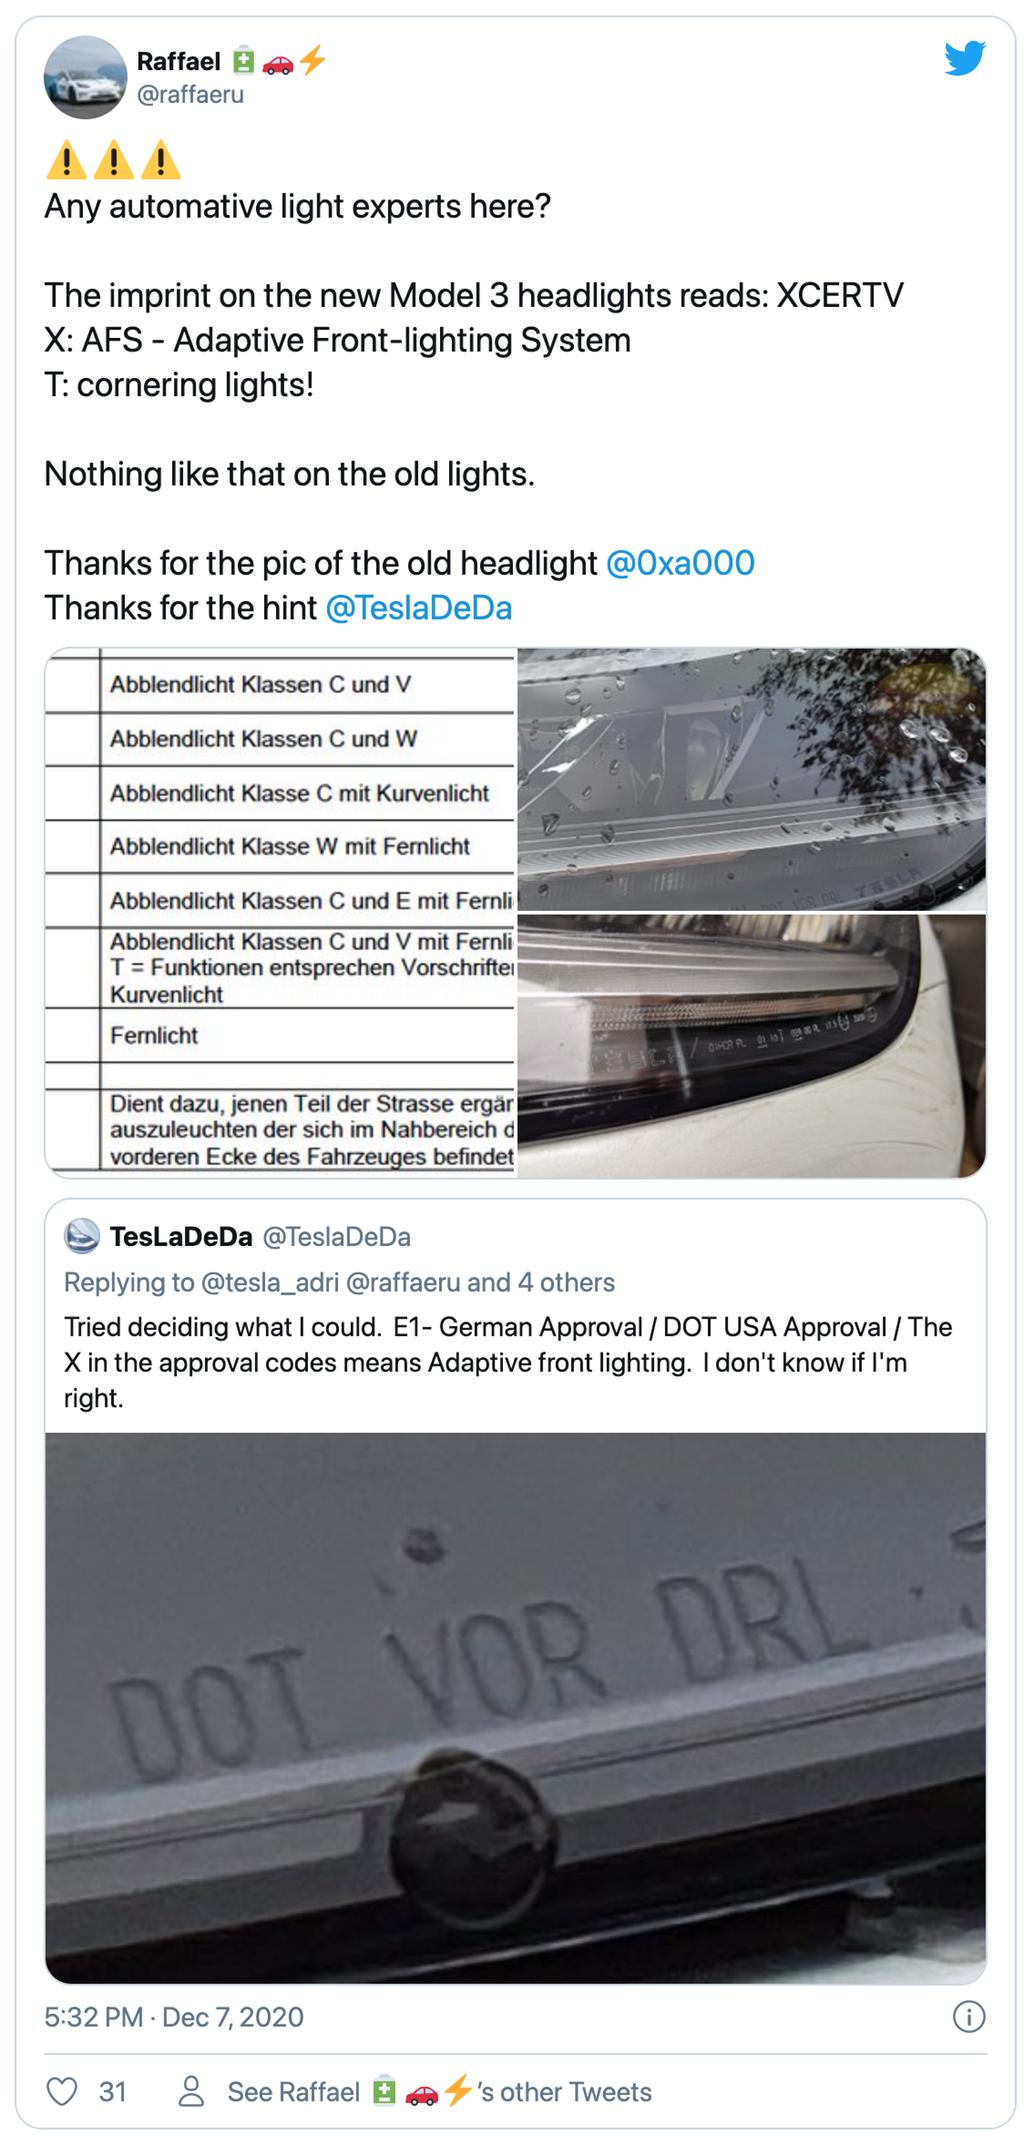 Model 3 可能偷偷增加主動頭燈轉向照明系統,未來透過 OTA 付費解鎖?